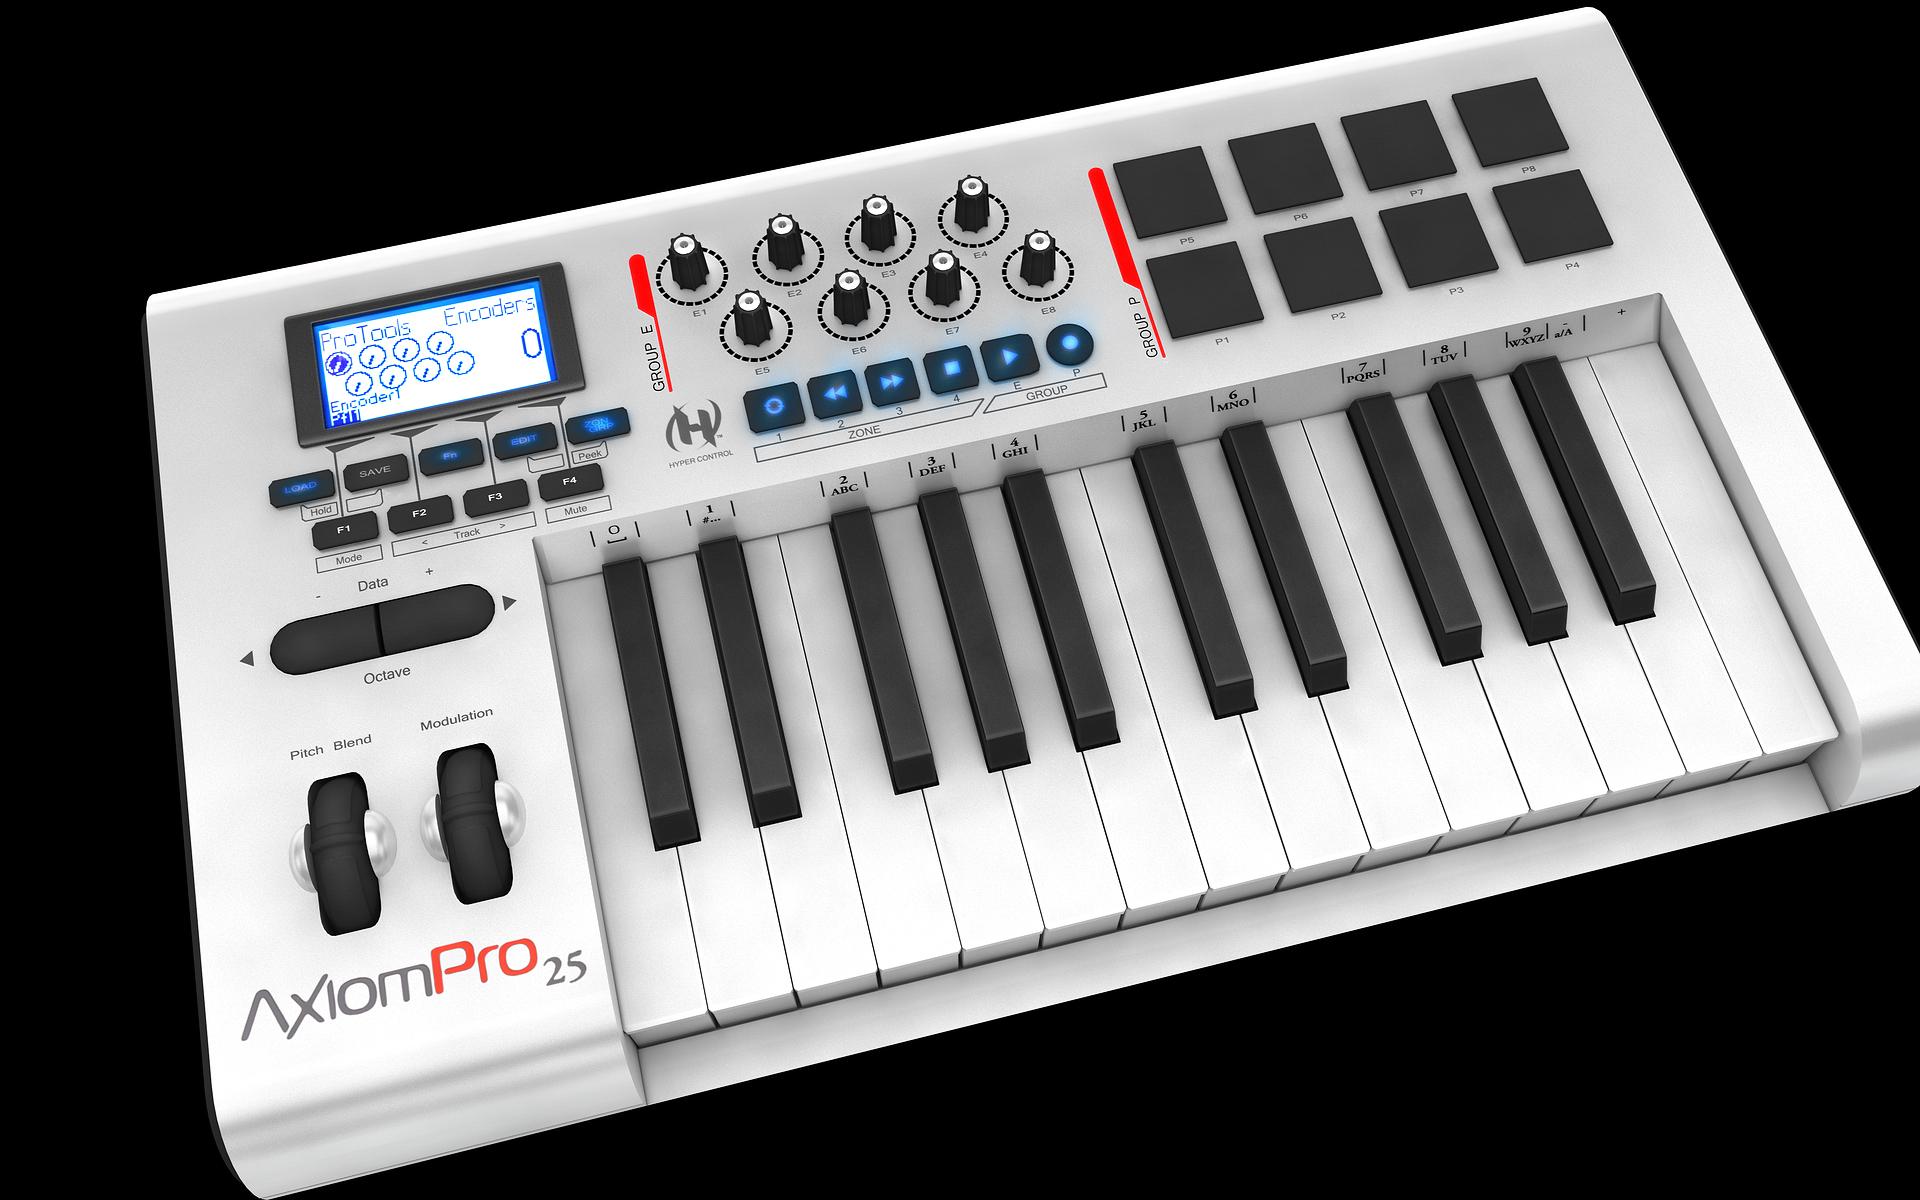 m audio axiom pro 25 image 366317 audiofanzine rh en audiofanzine com M-Audio Axiom 61 Software Axiom 25 MIDI-Controller